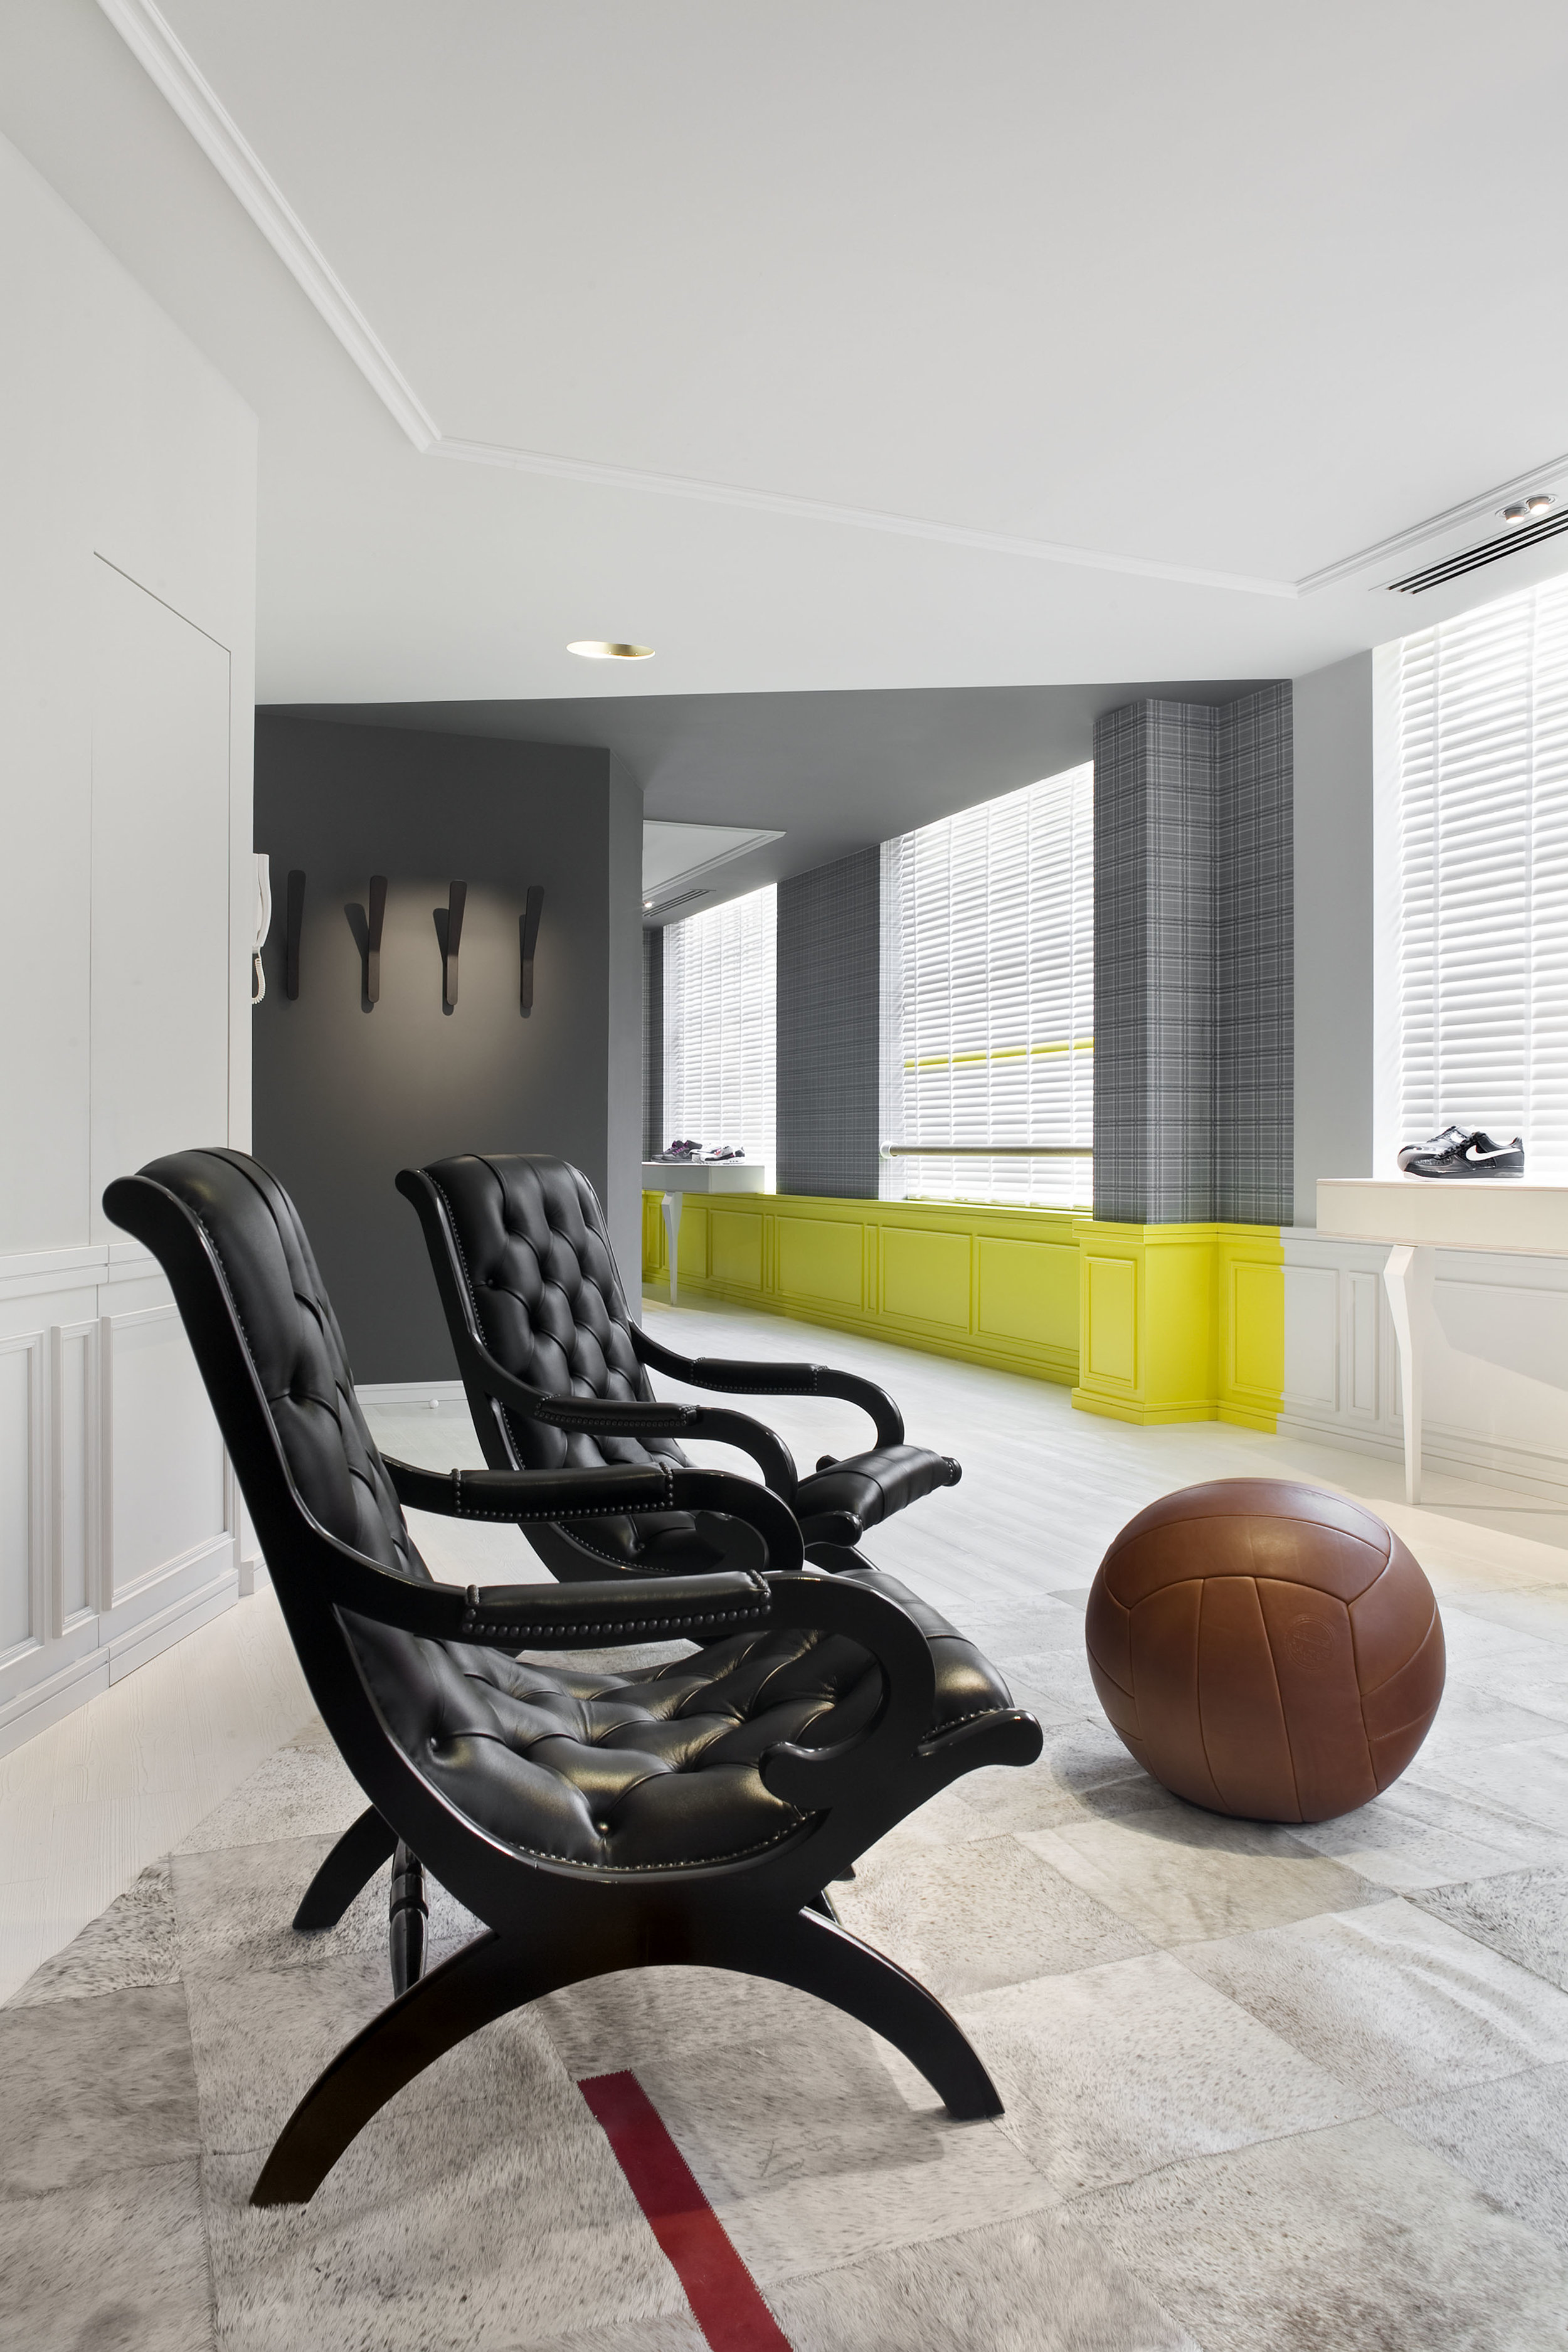 nike_coorporate-interior-design_coordination-berlin_08.jpg